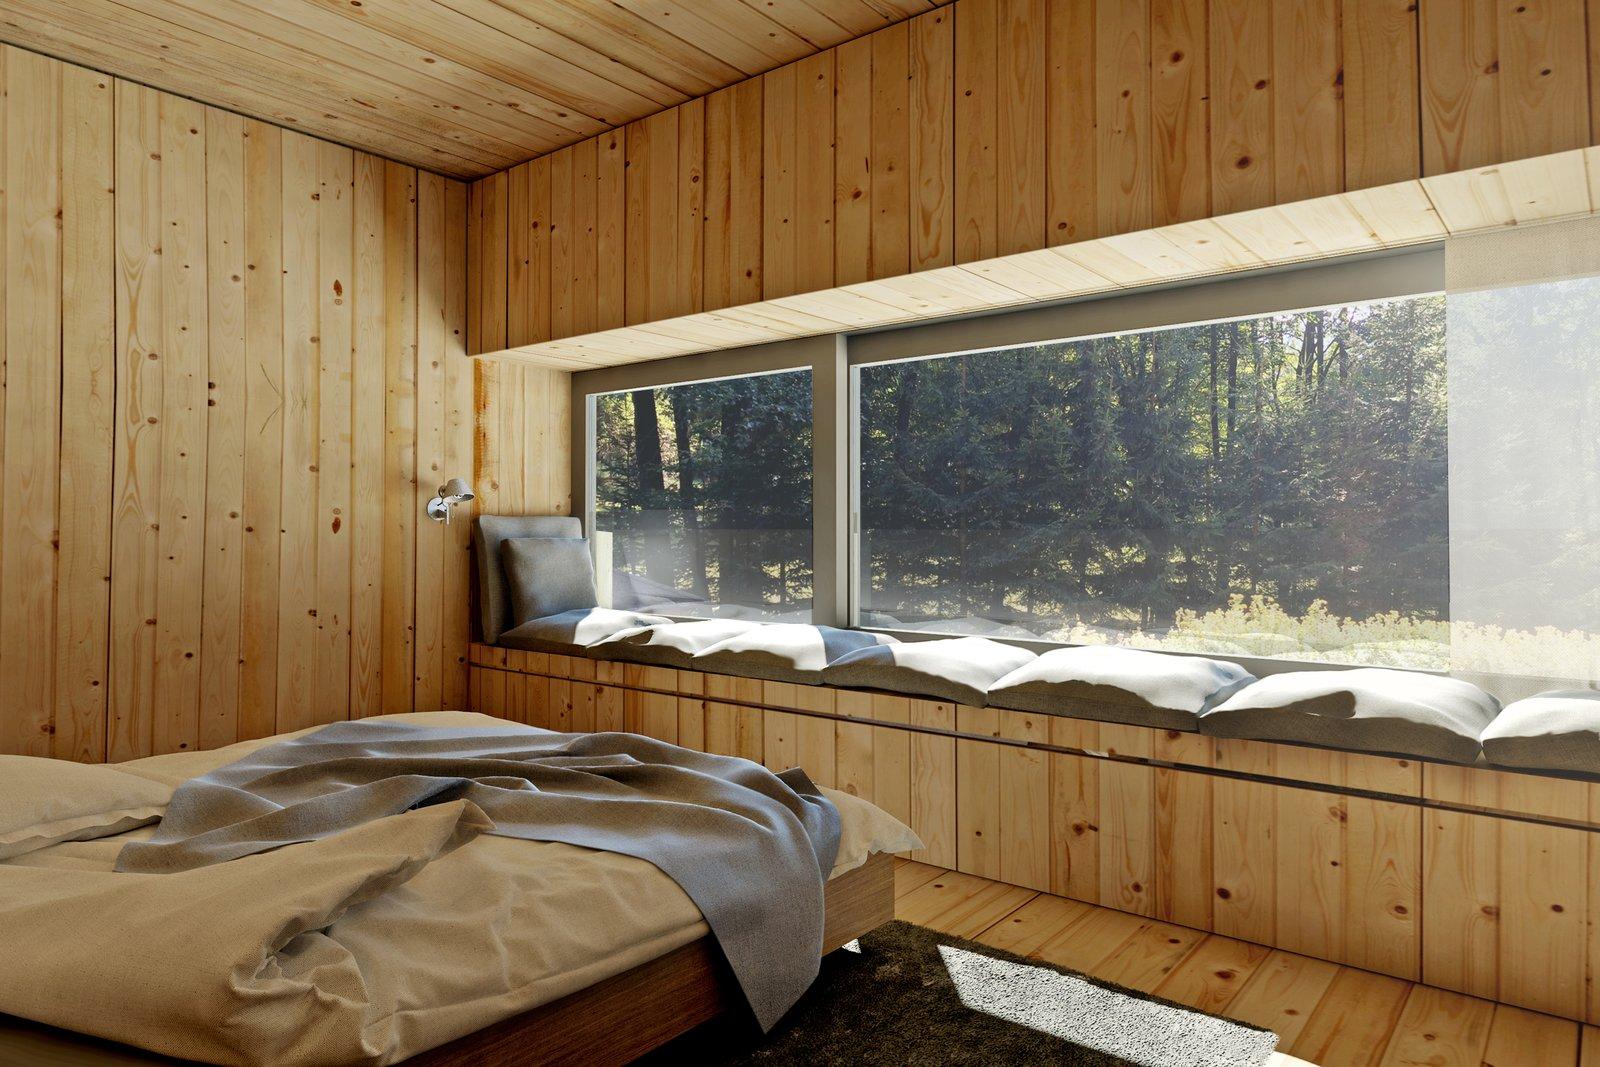 Mountain hut bedroom